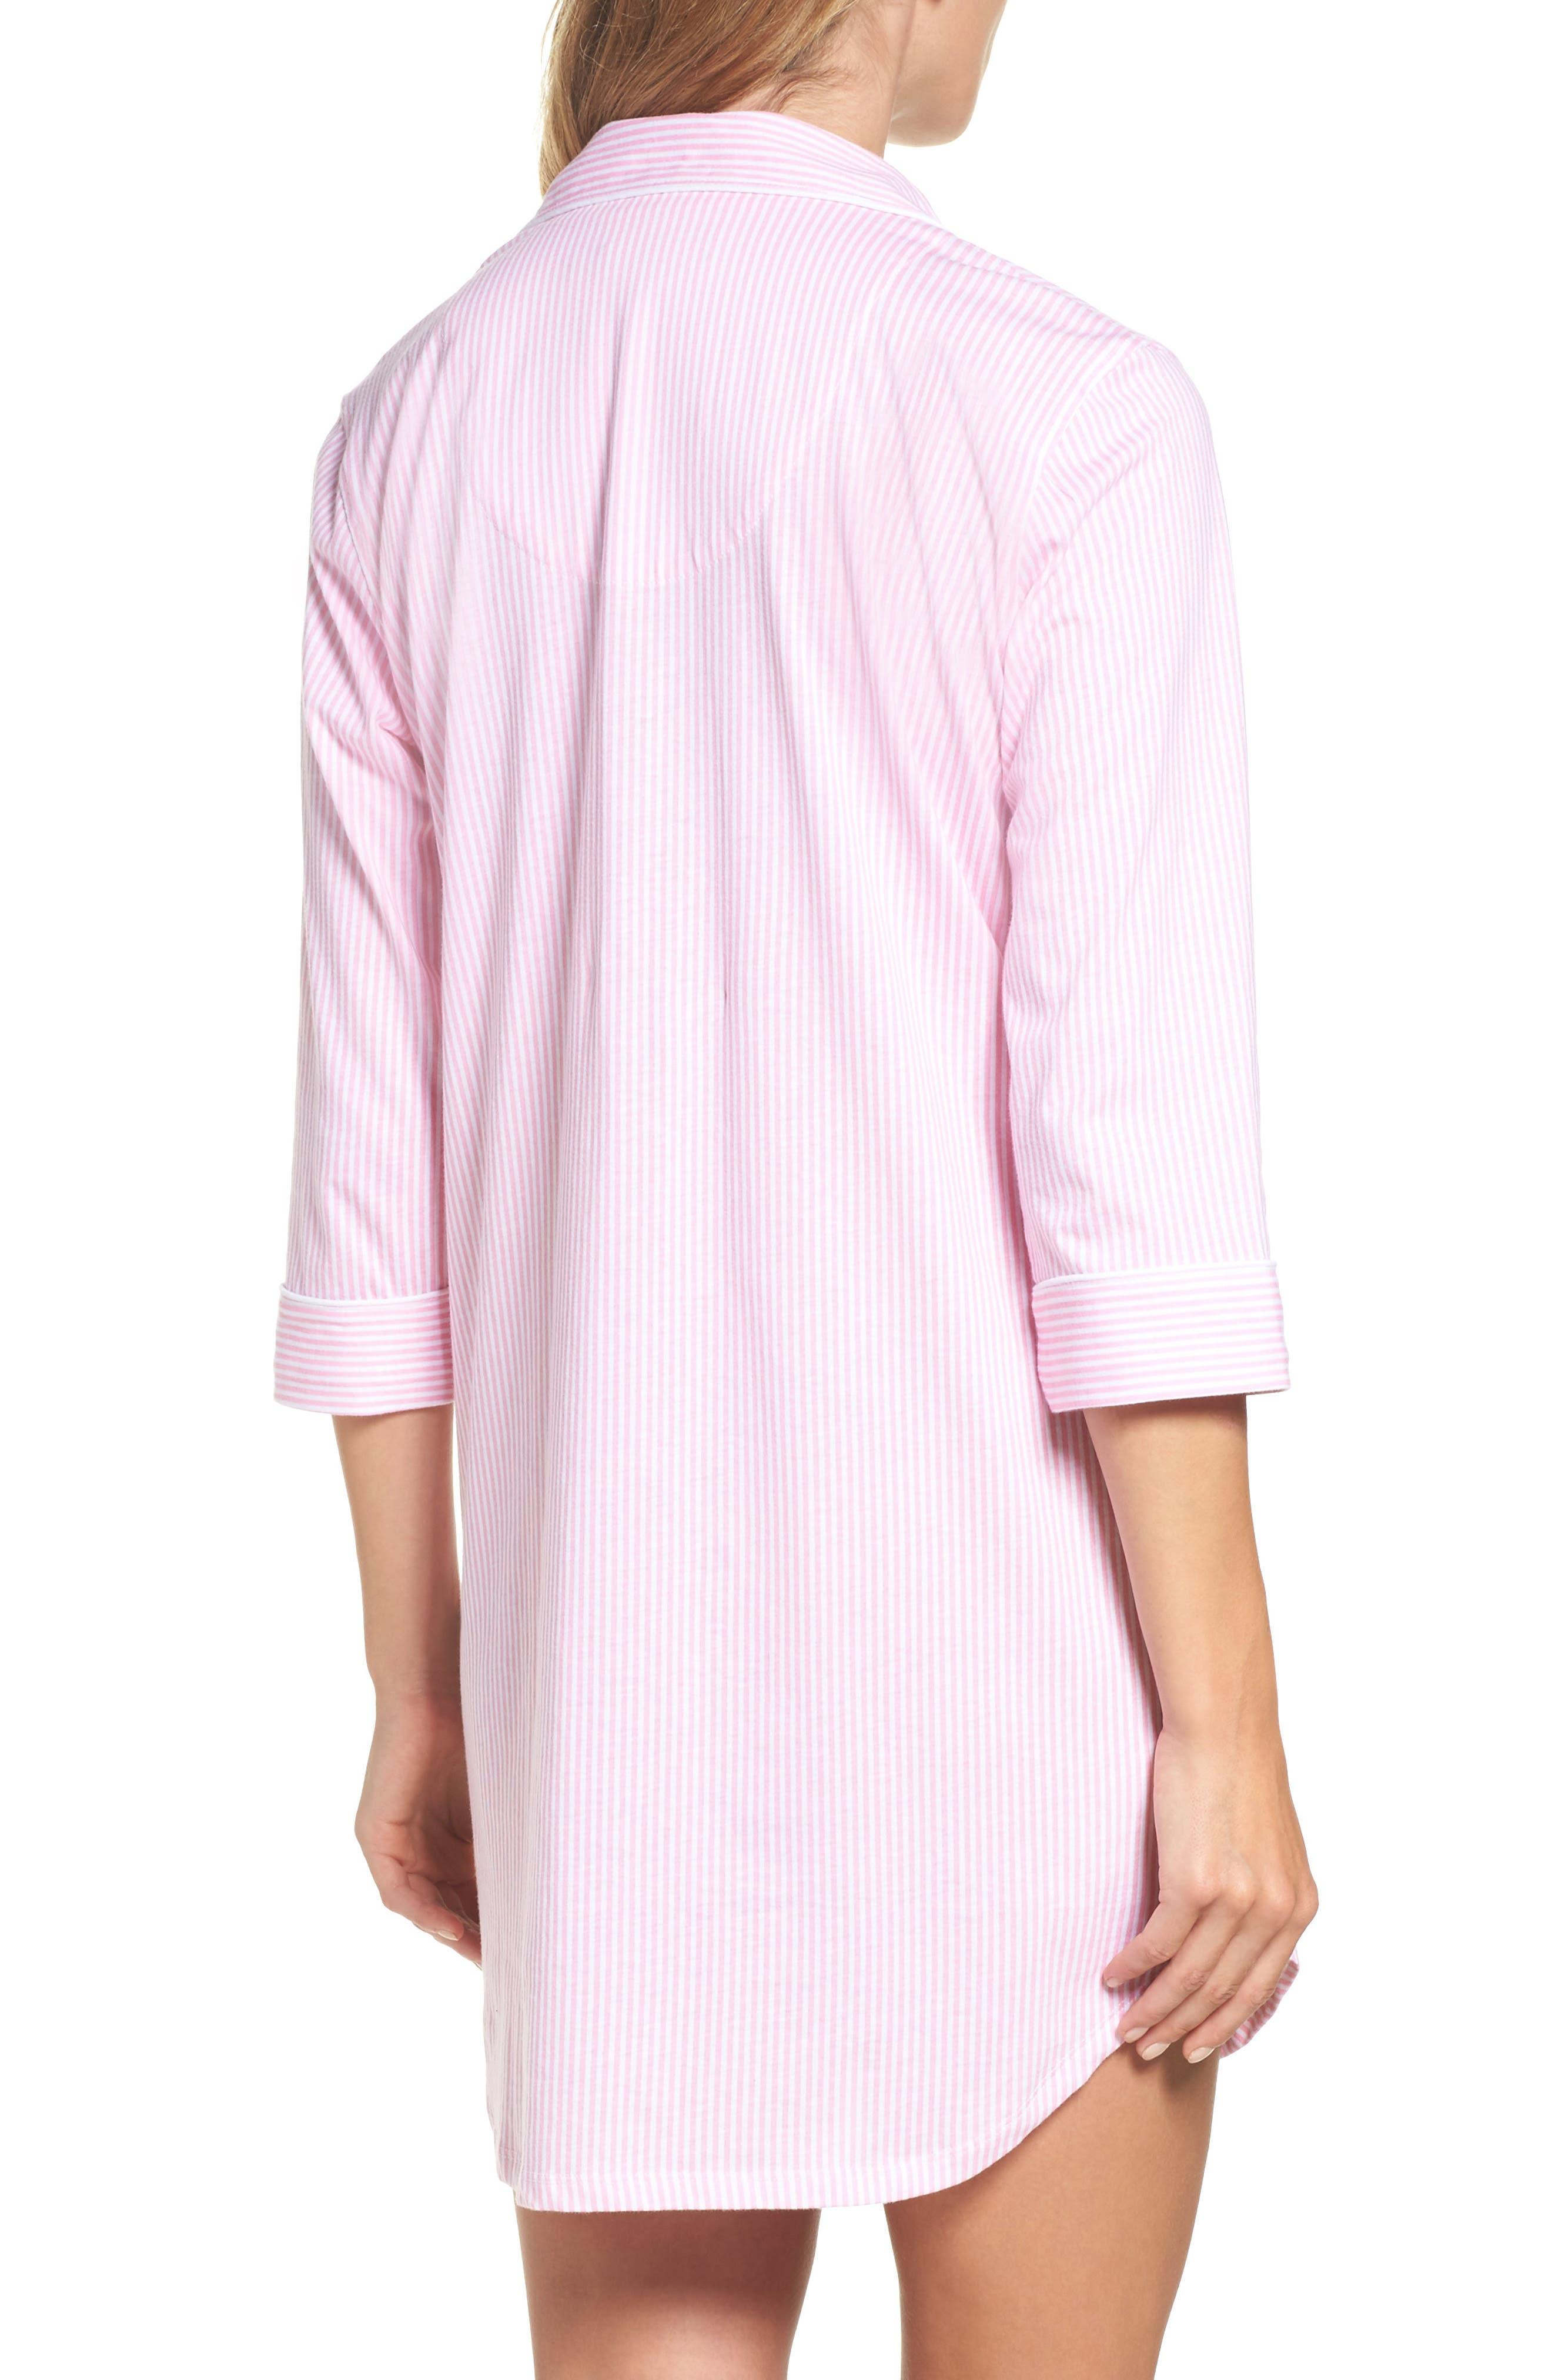 Jersey Sleep Shirt,                             Alternate thumbnail 20, color,